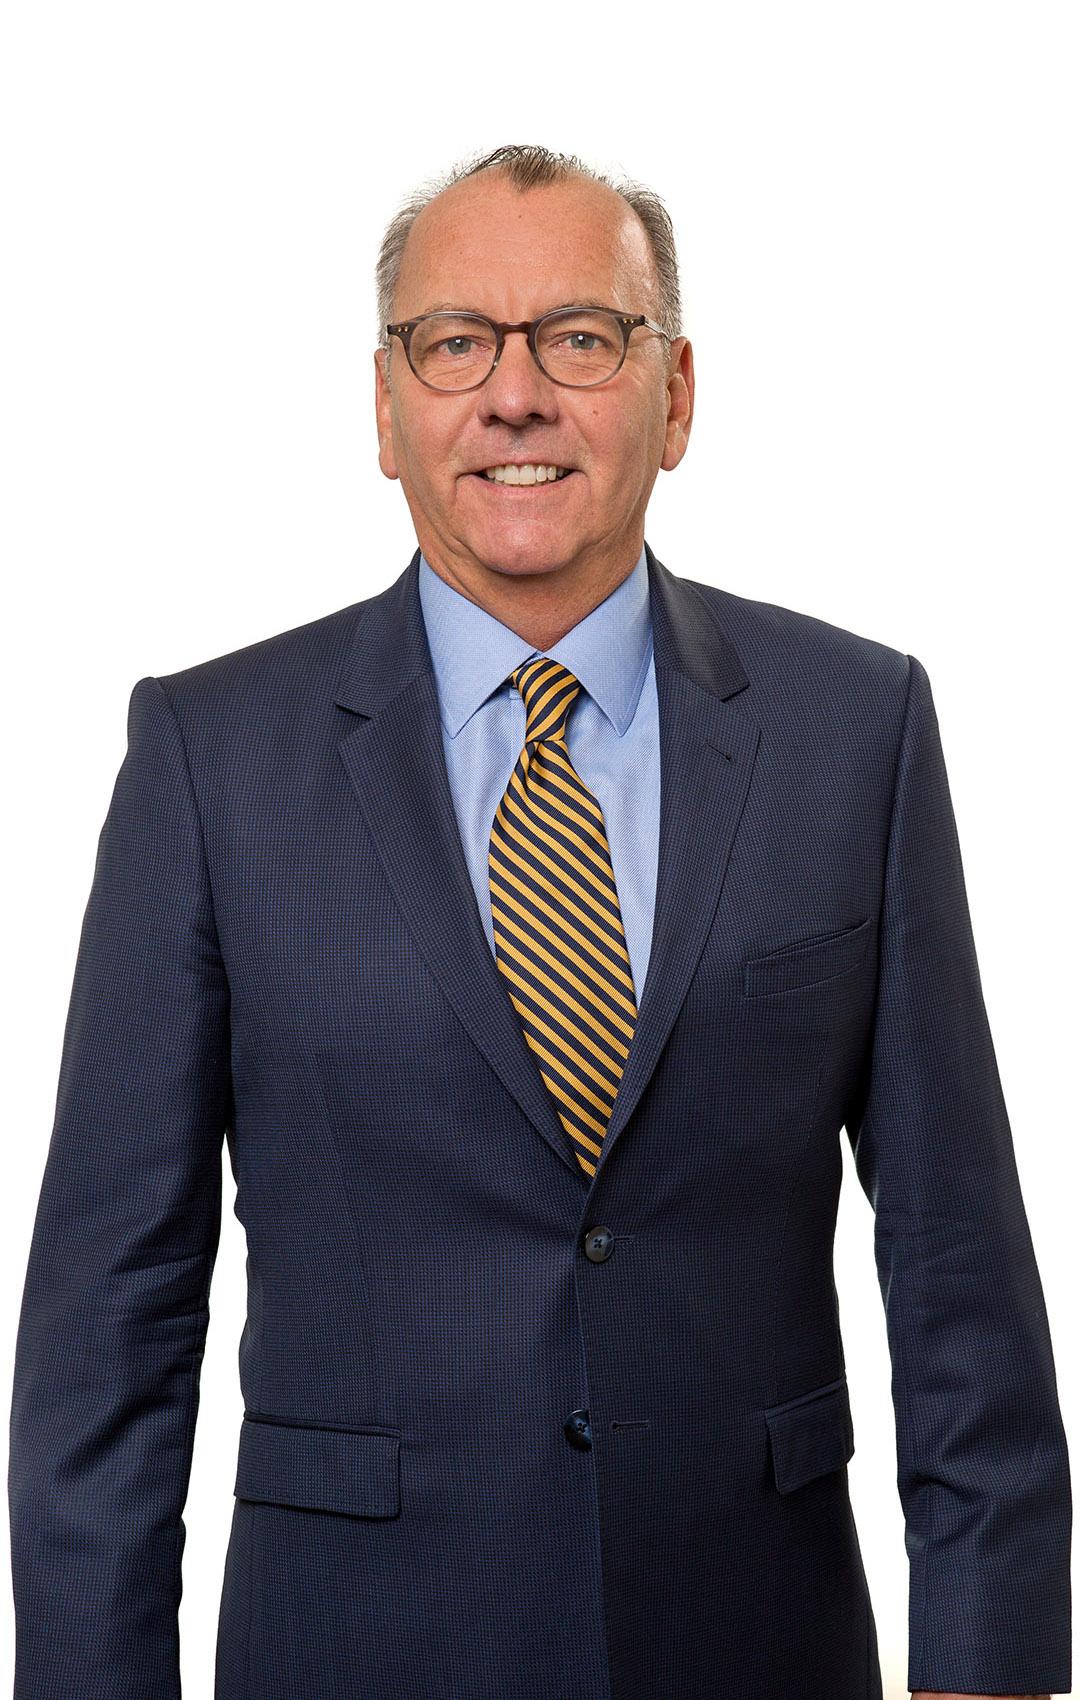 James J. Wheeler